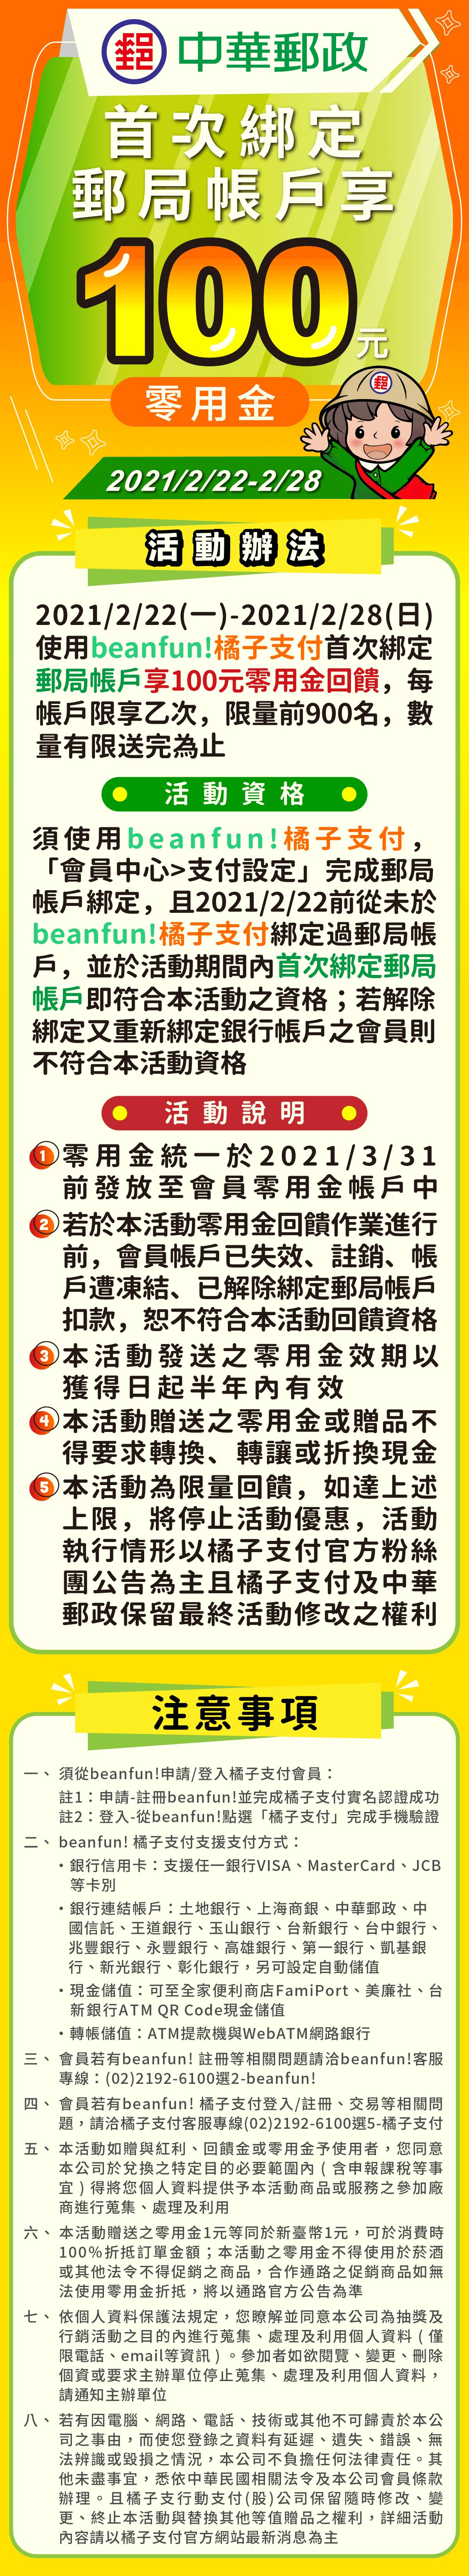 Fw: [情報] beanfun橘子支付首綁郵局帳戶享100零用金